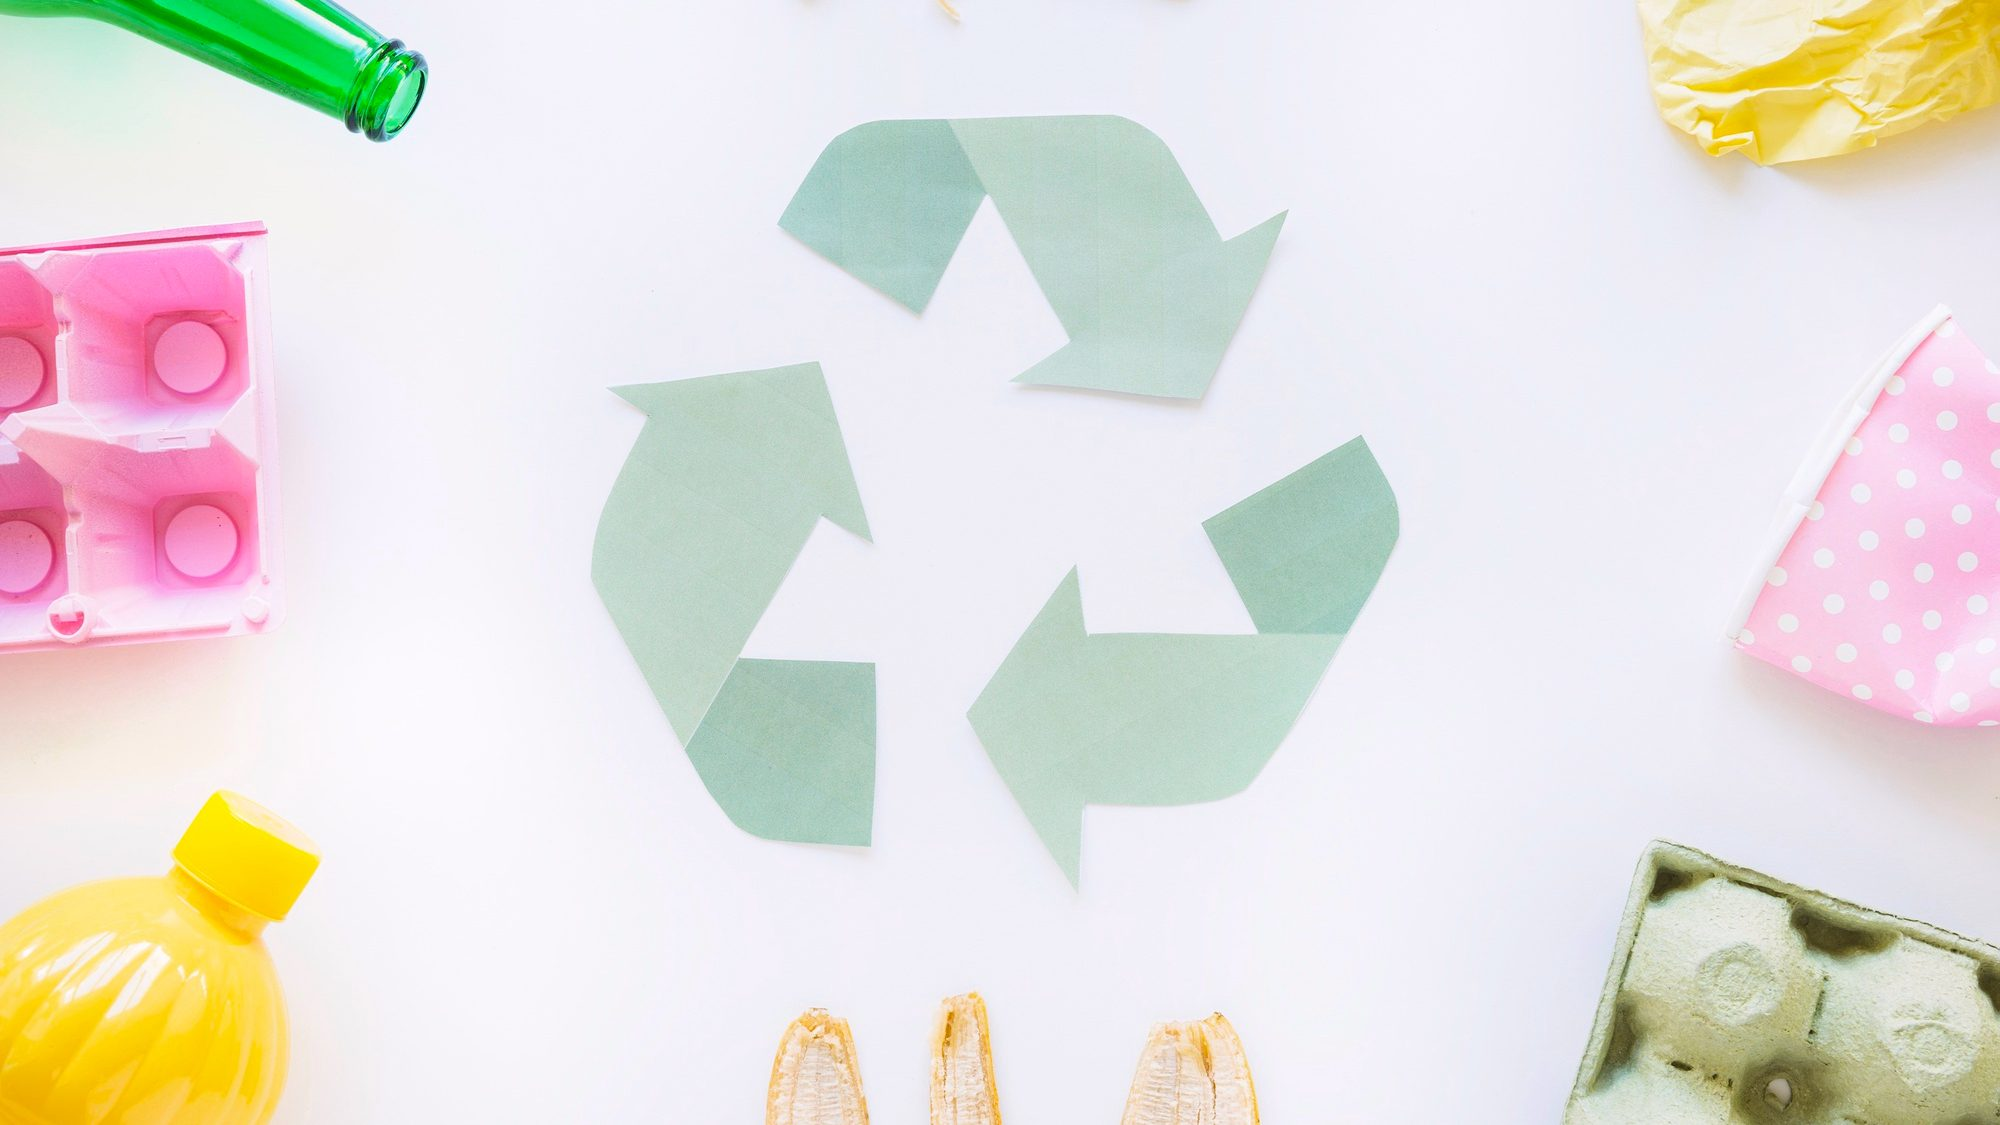 circular economy-recycling symbol